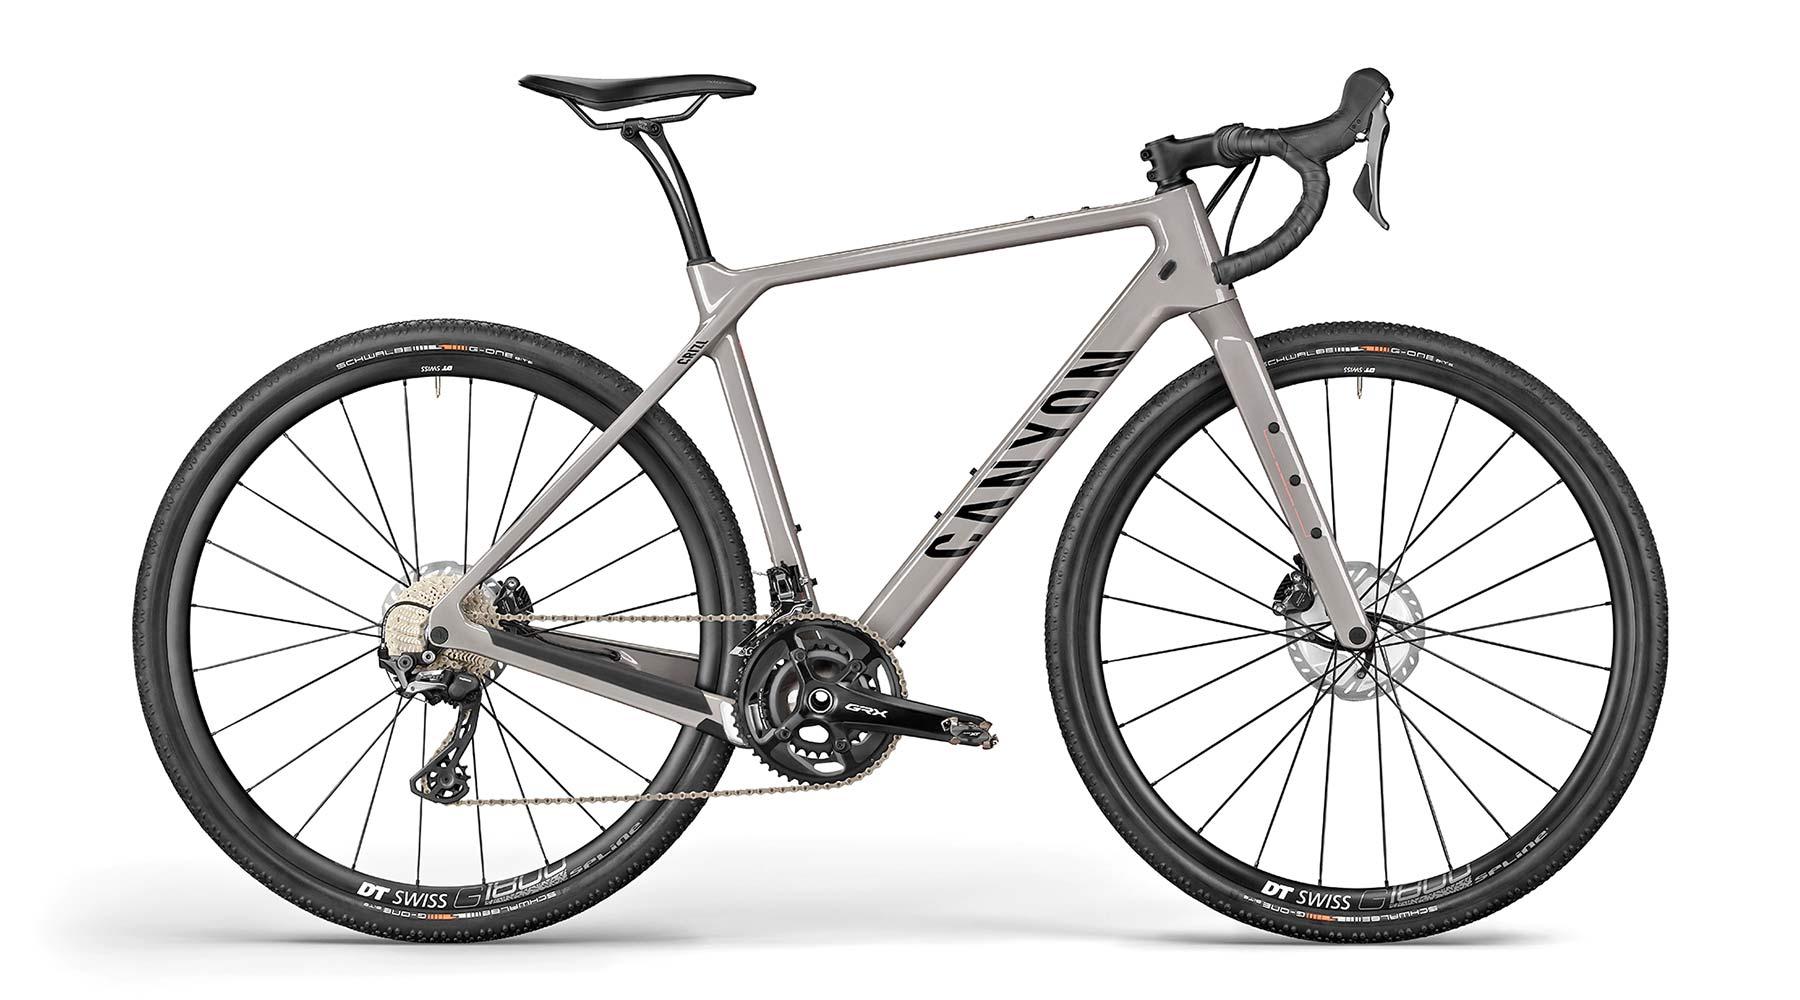 All-new 2021 Canyon Grizl carbon gravel bike bikepacking adventure, CF SL8